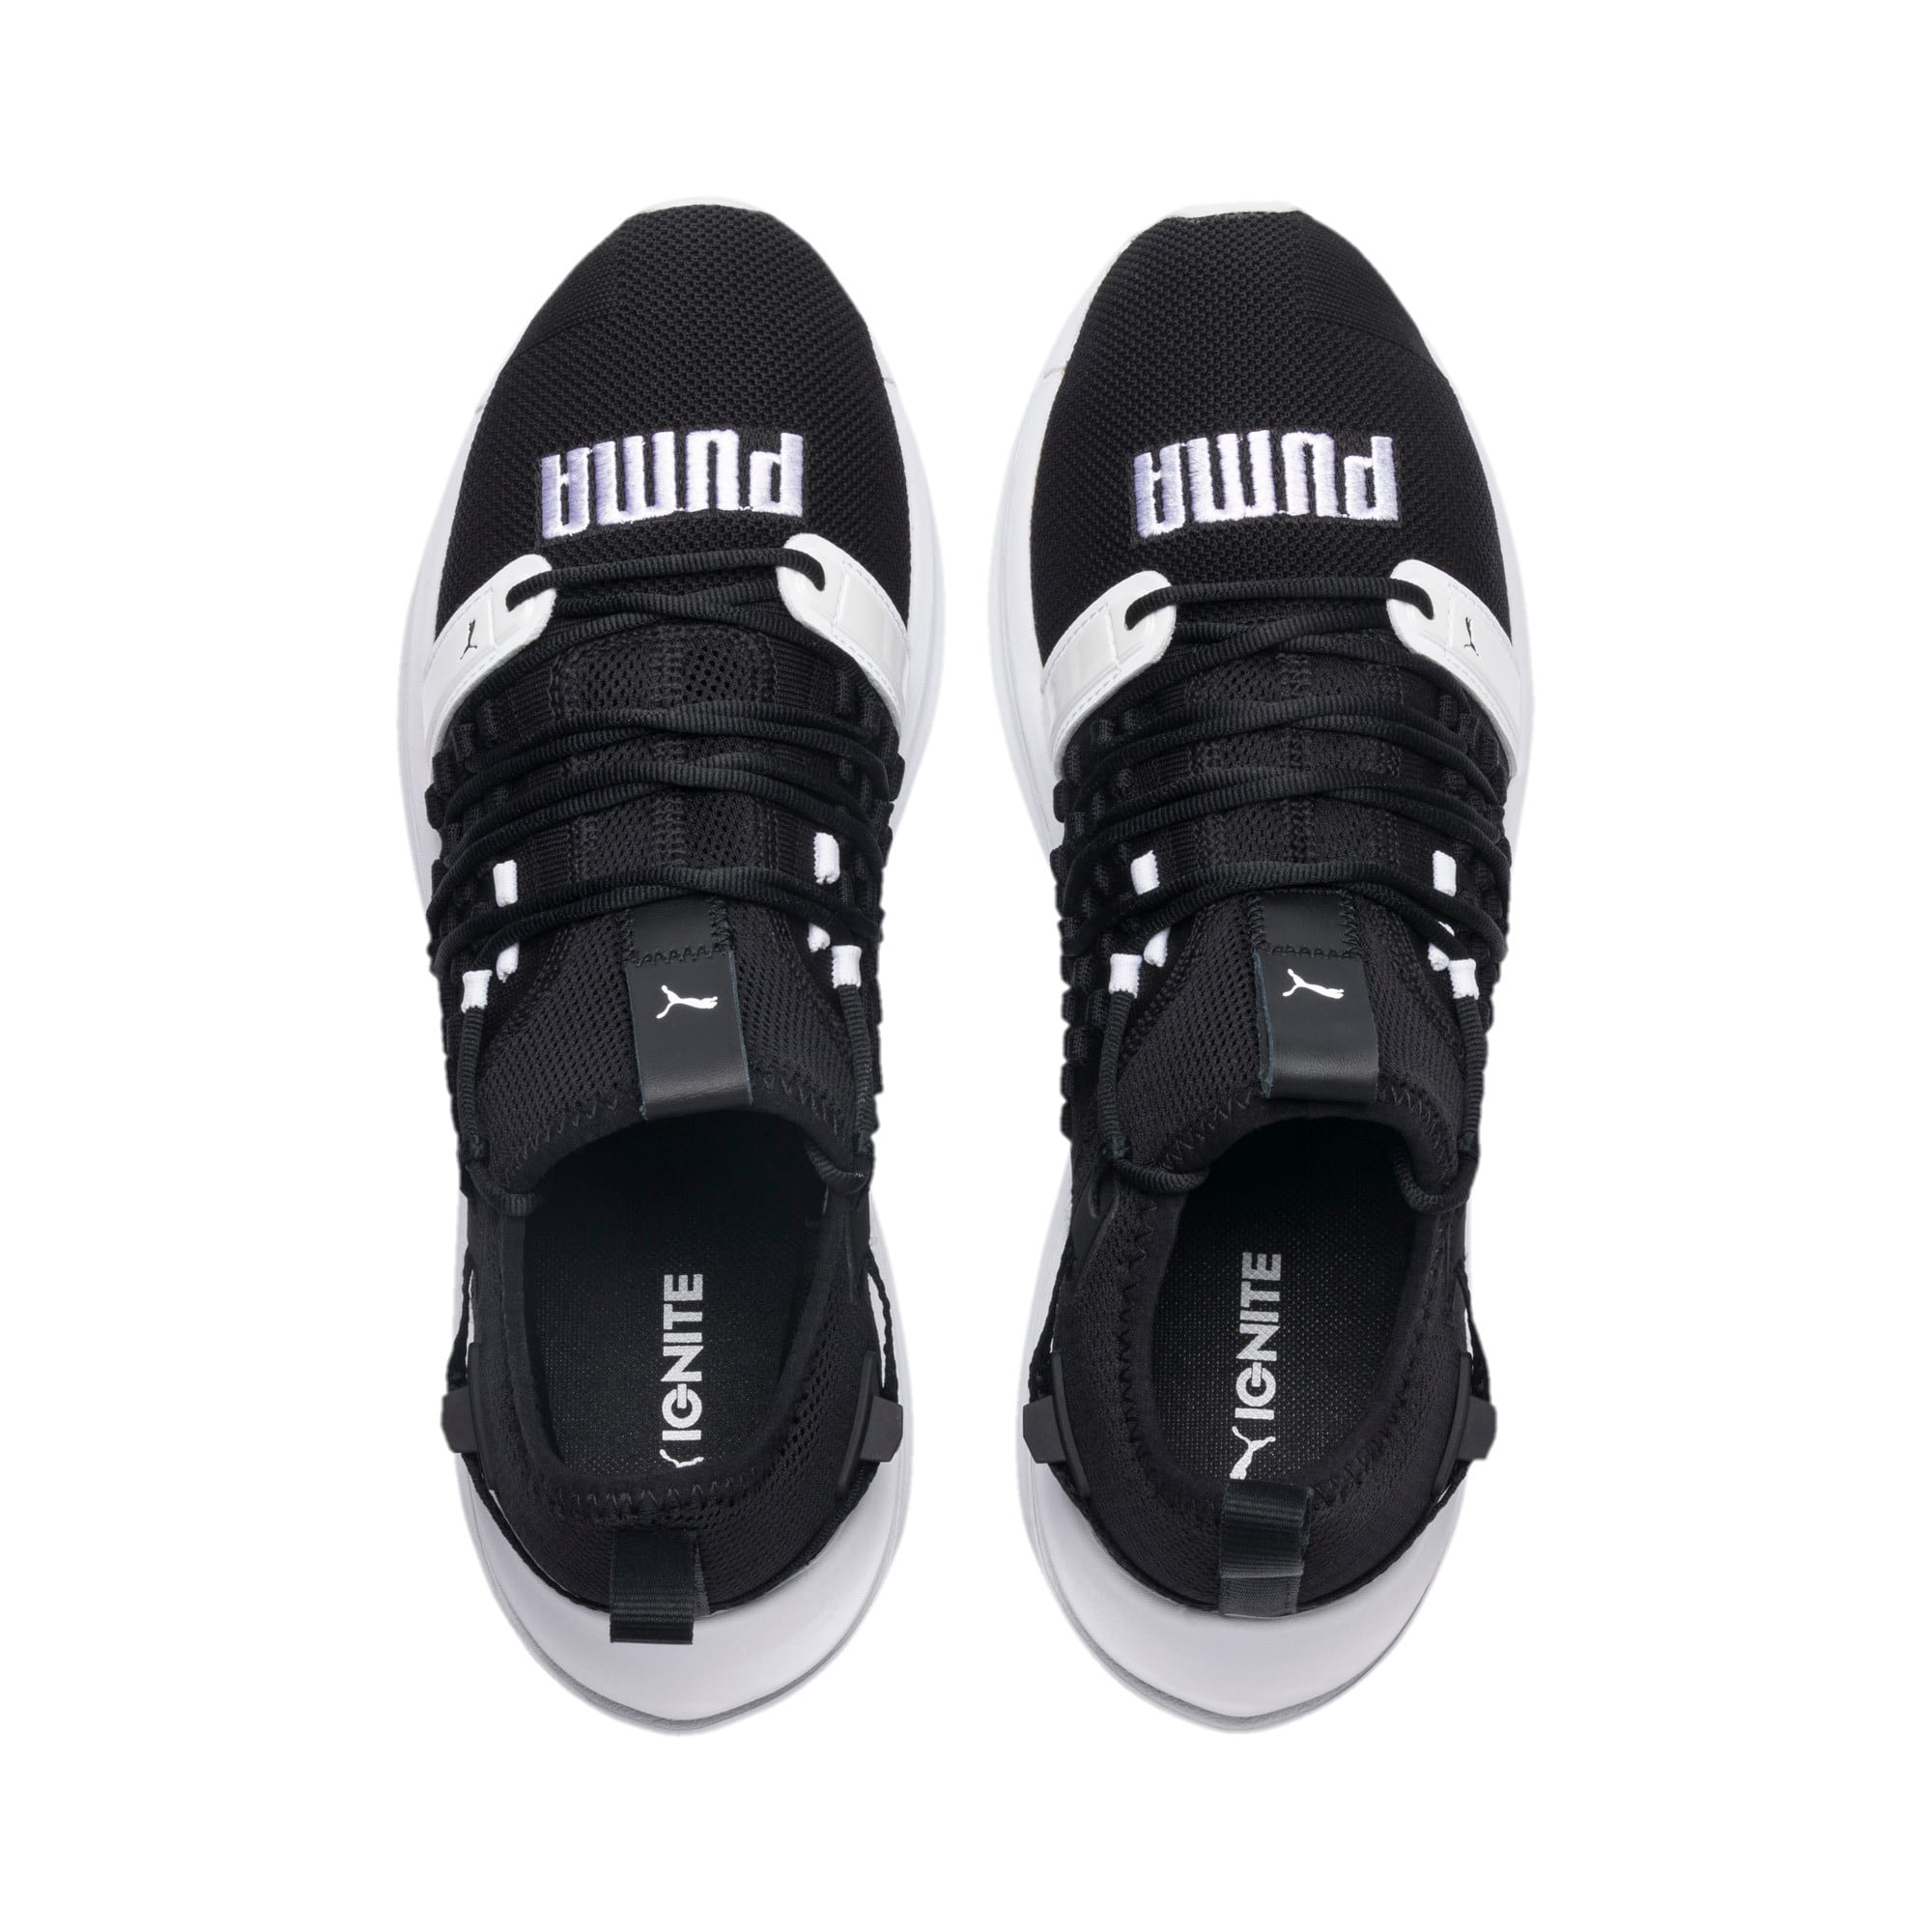 Thumbnail 6 of IGNITE Limitless SR FUSEFIT Running Shoes, Puma Black-Puma White, medium-IND